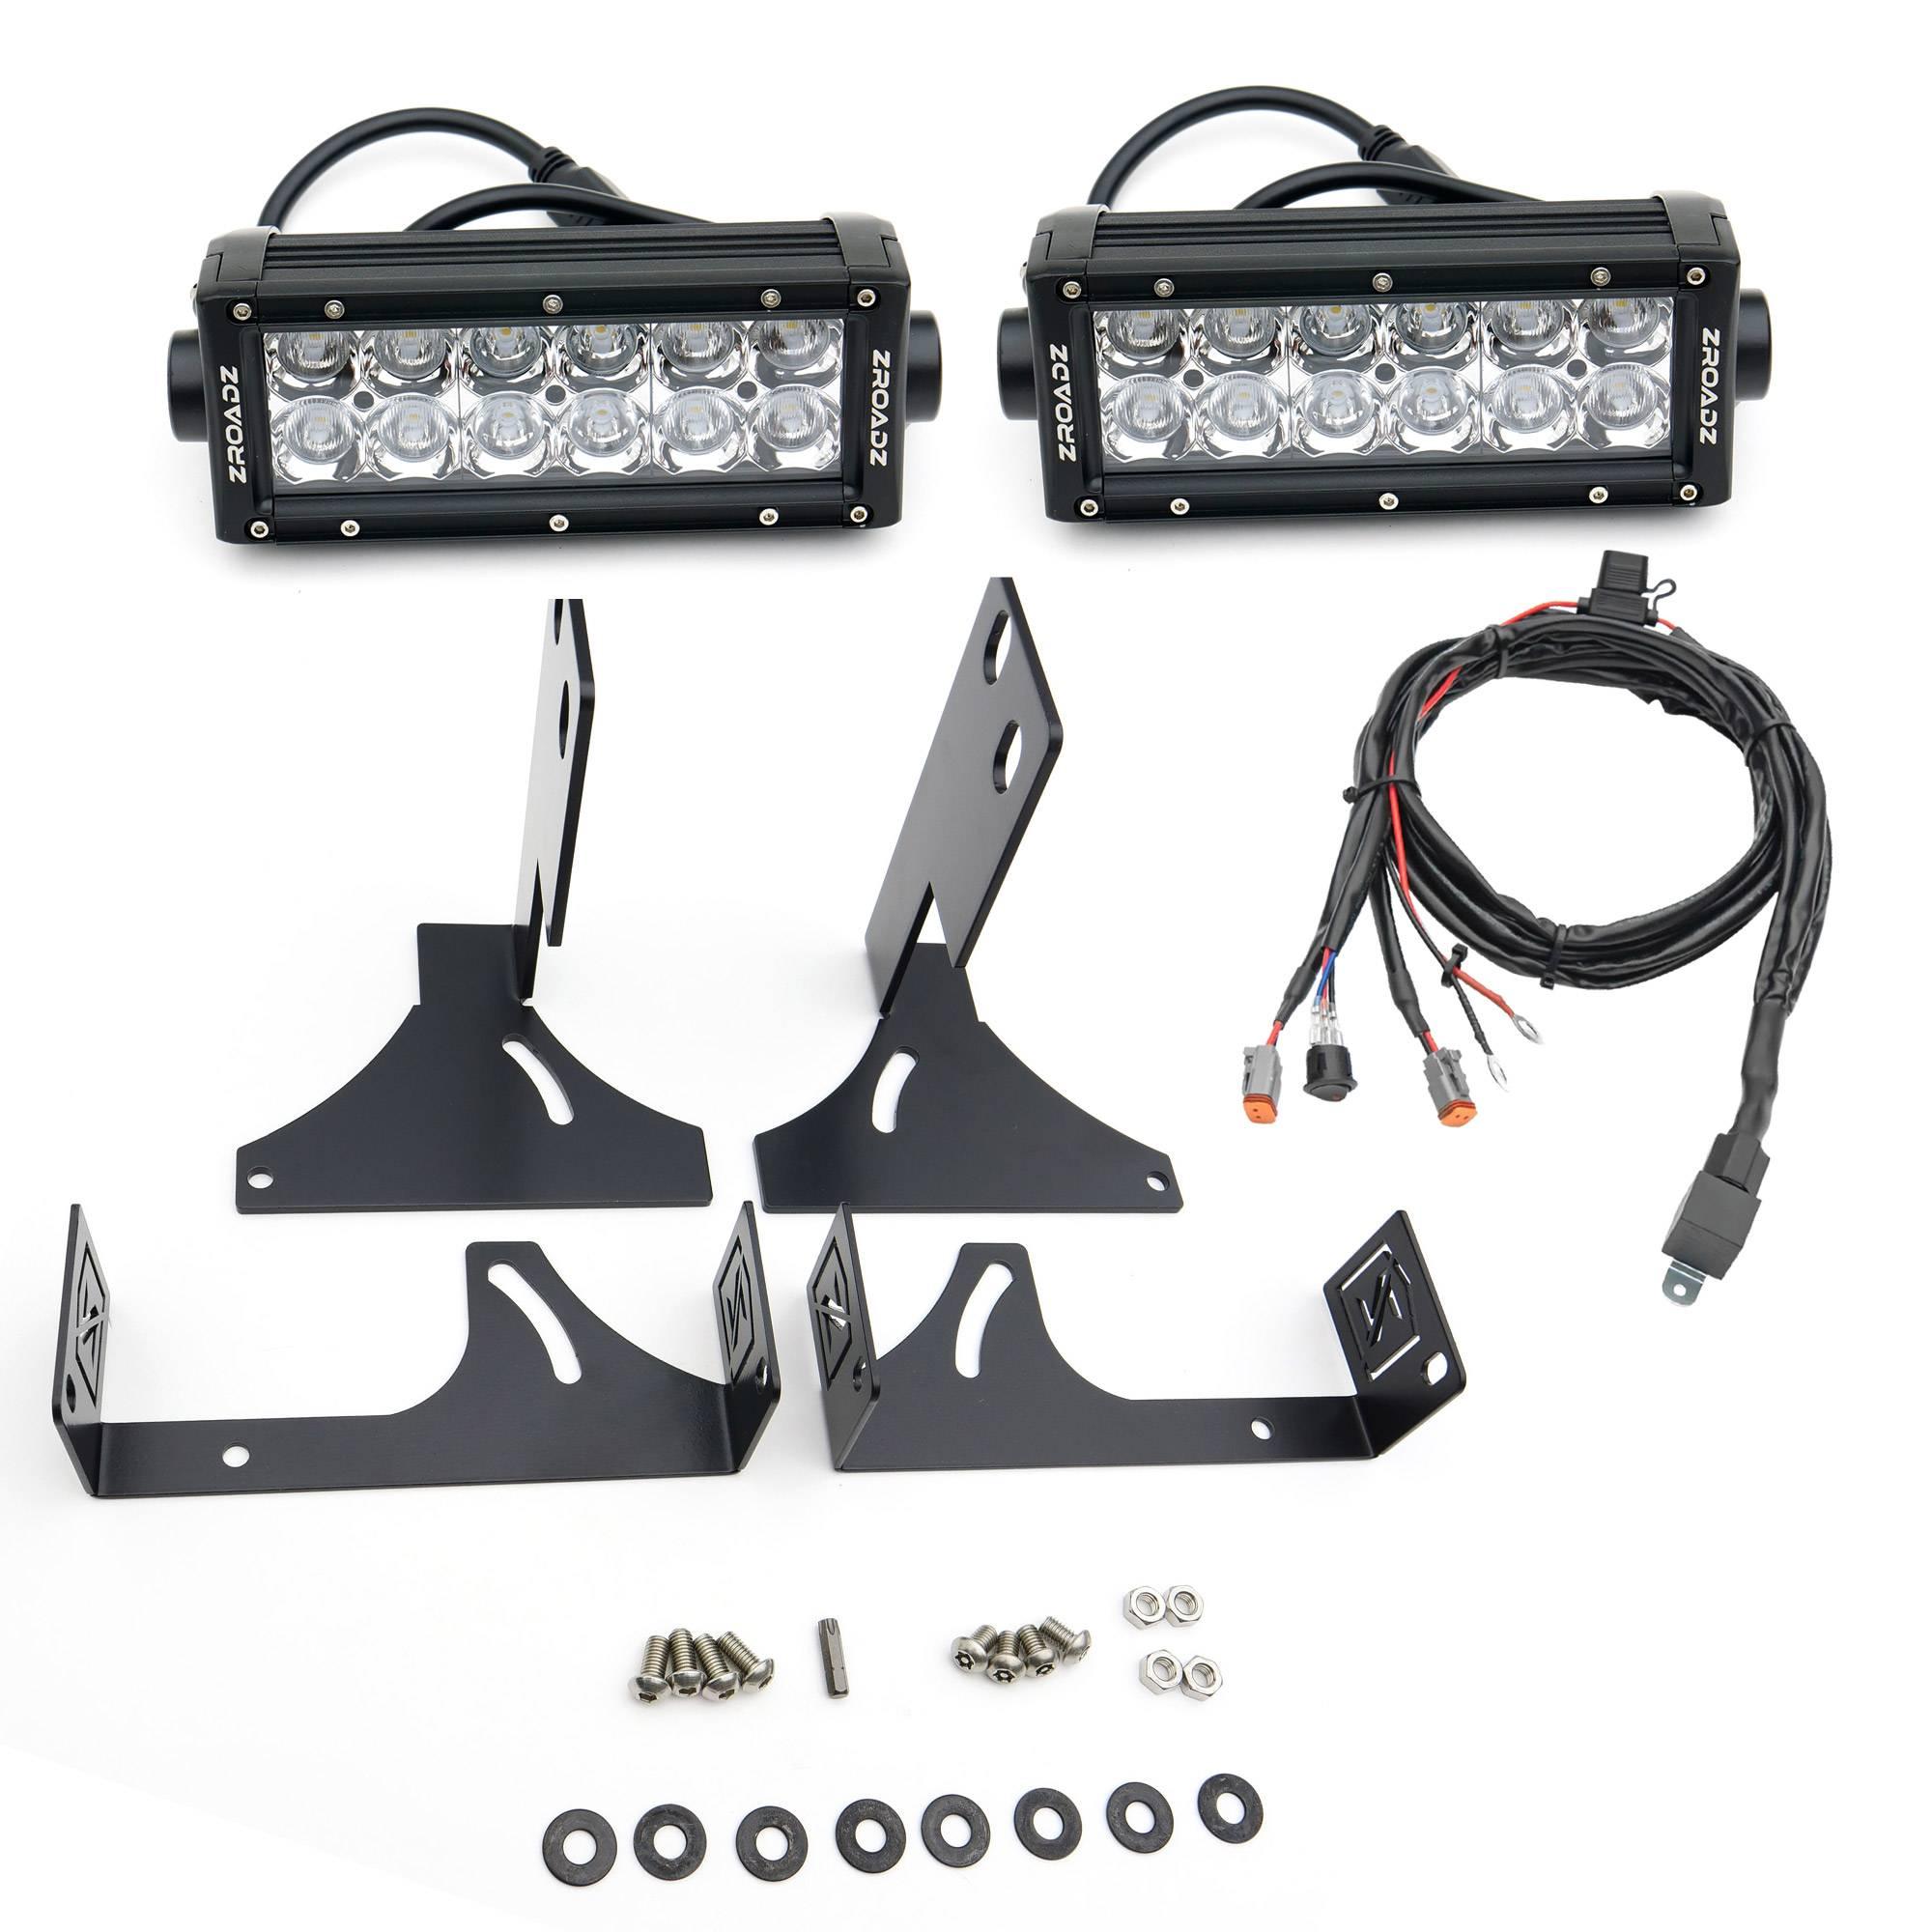 ZROADZ - 2008-2016 Ford Super Duty Rear Bumper LED Kit with (2) 6 Inch LED Straight Double Row Light Bars - PN #Z385461-KIT